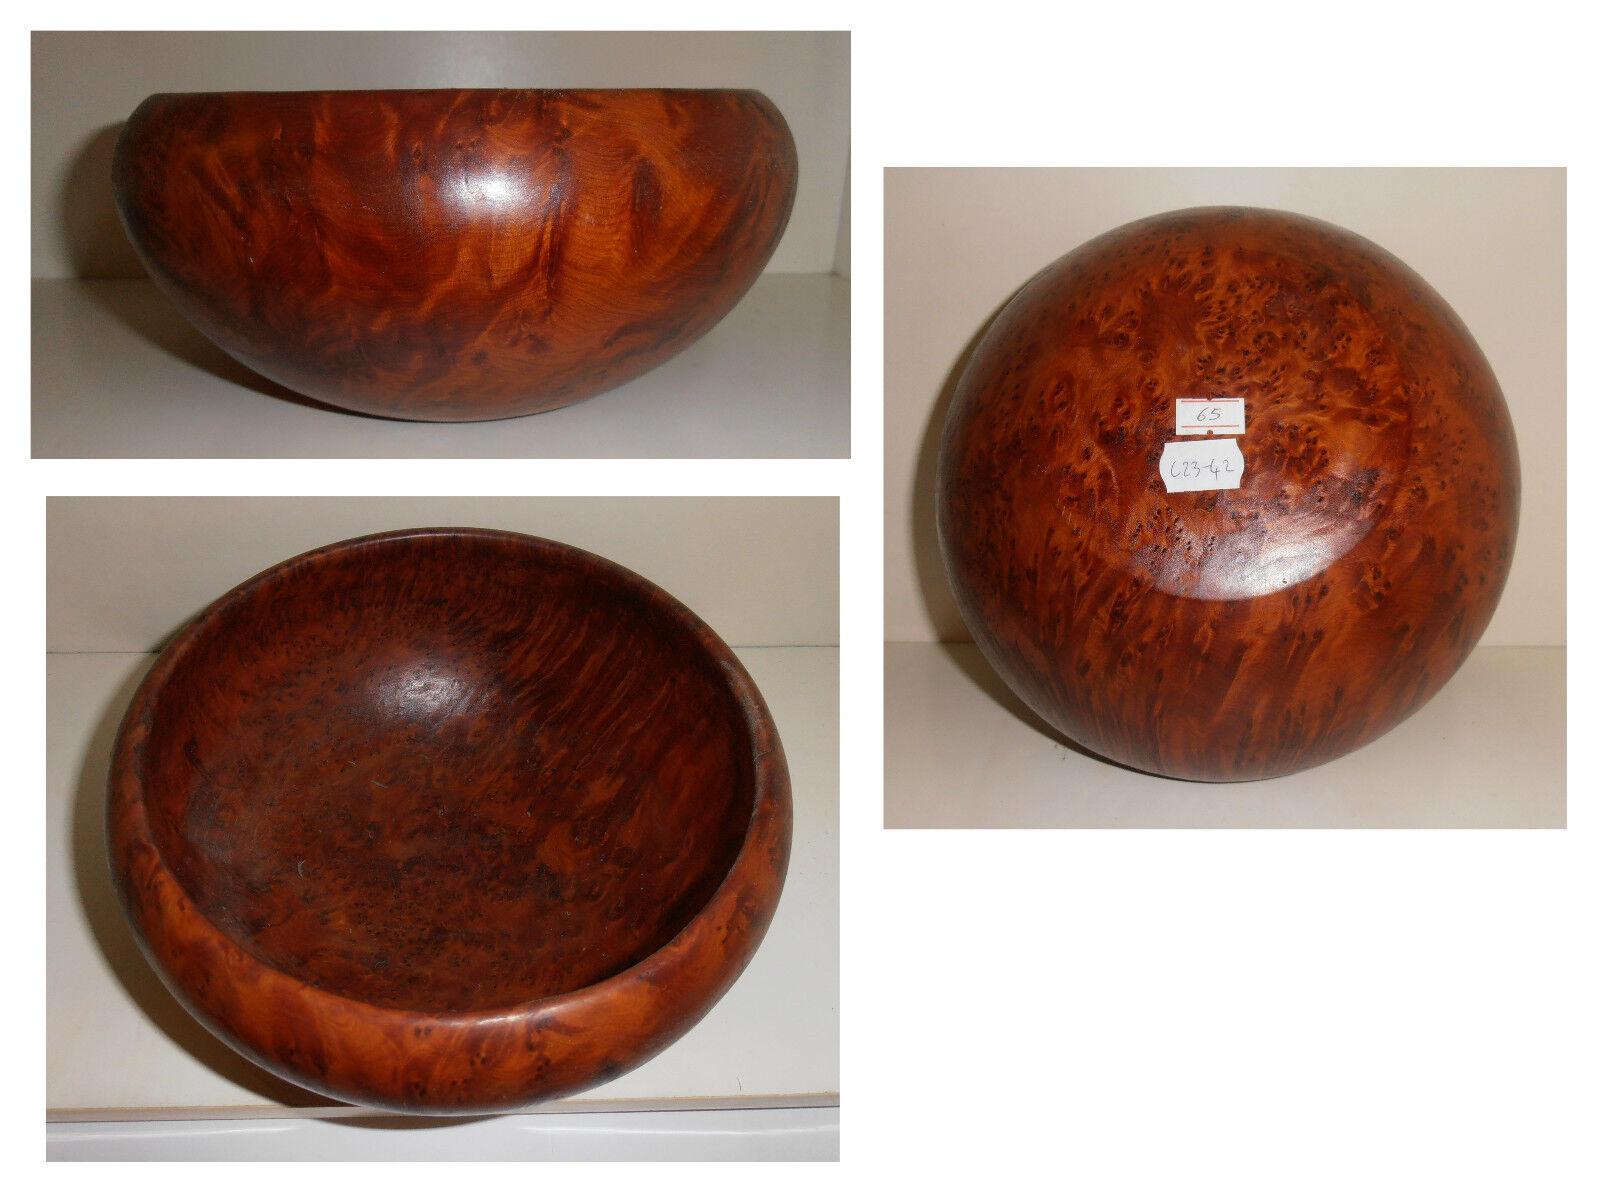 Ciotola cm 23 radica, legno radice tuya tuja tuia, artigianato africano, C23-42